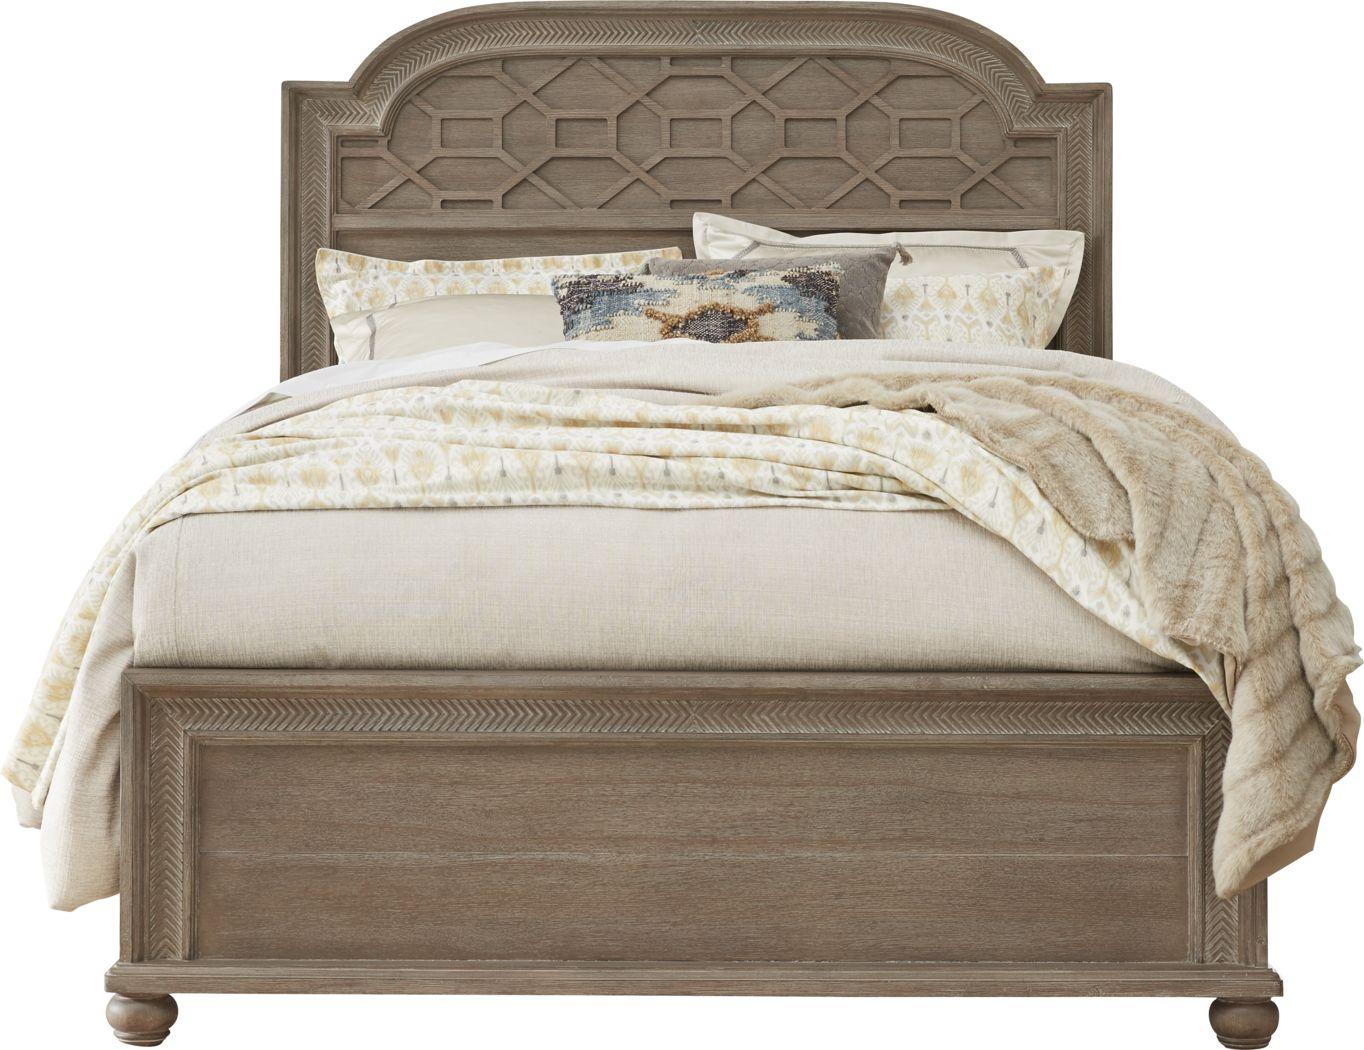 Cindy Crawford Home Abbington Gray 3 Pc King Panel Bed